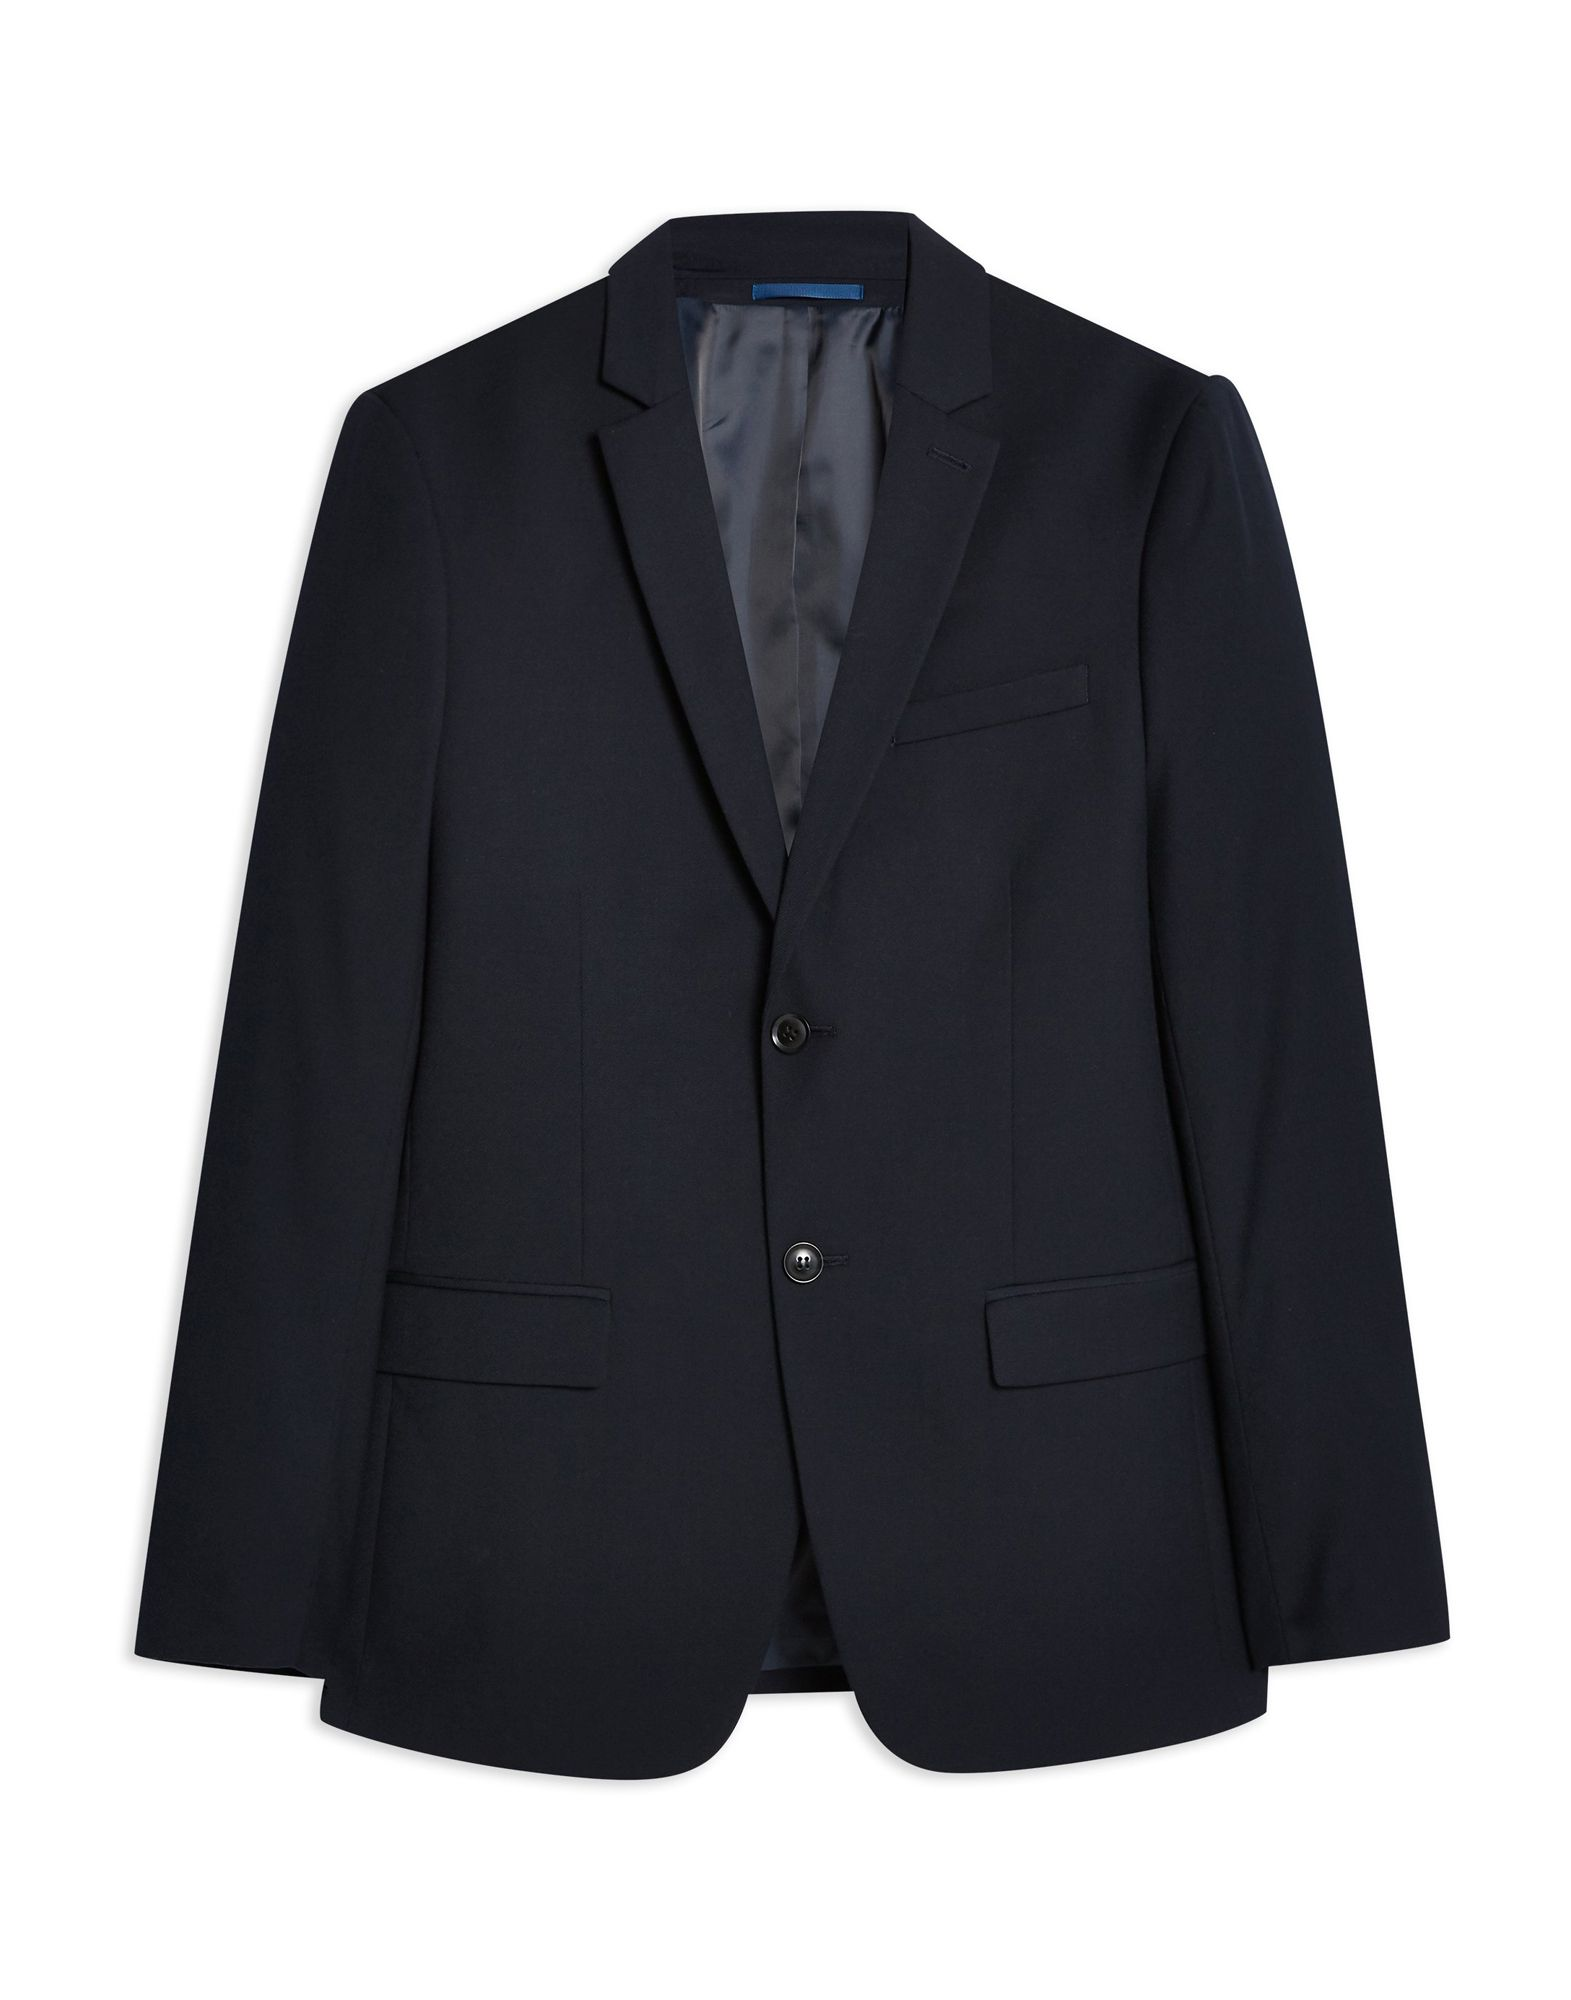 Giacca Topman Navy Texturosso Slim Slim Fit Suit Jacket - uomo - 49493739DX